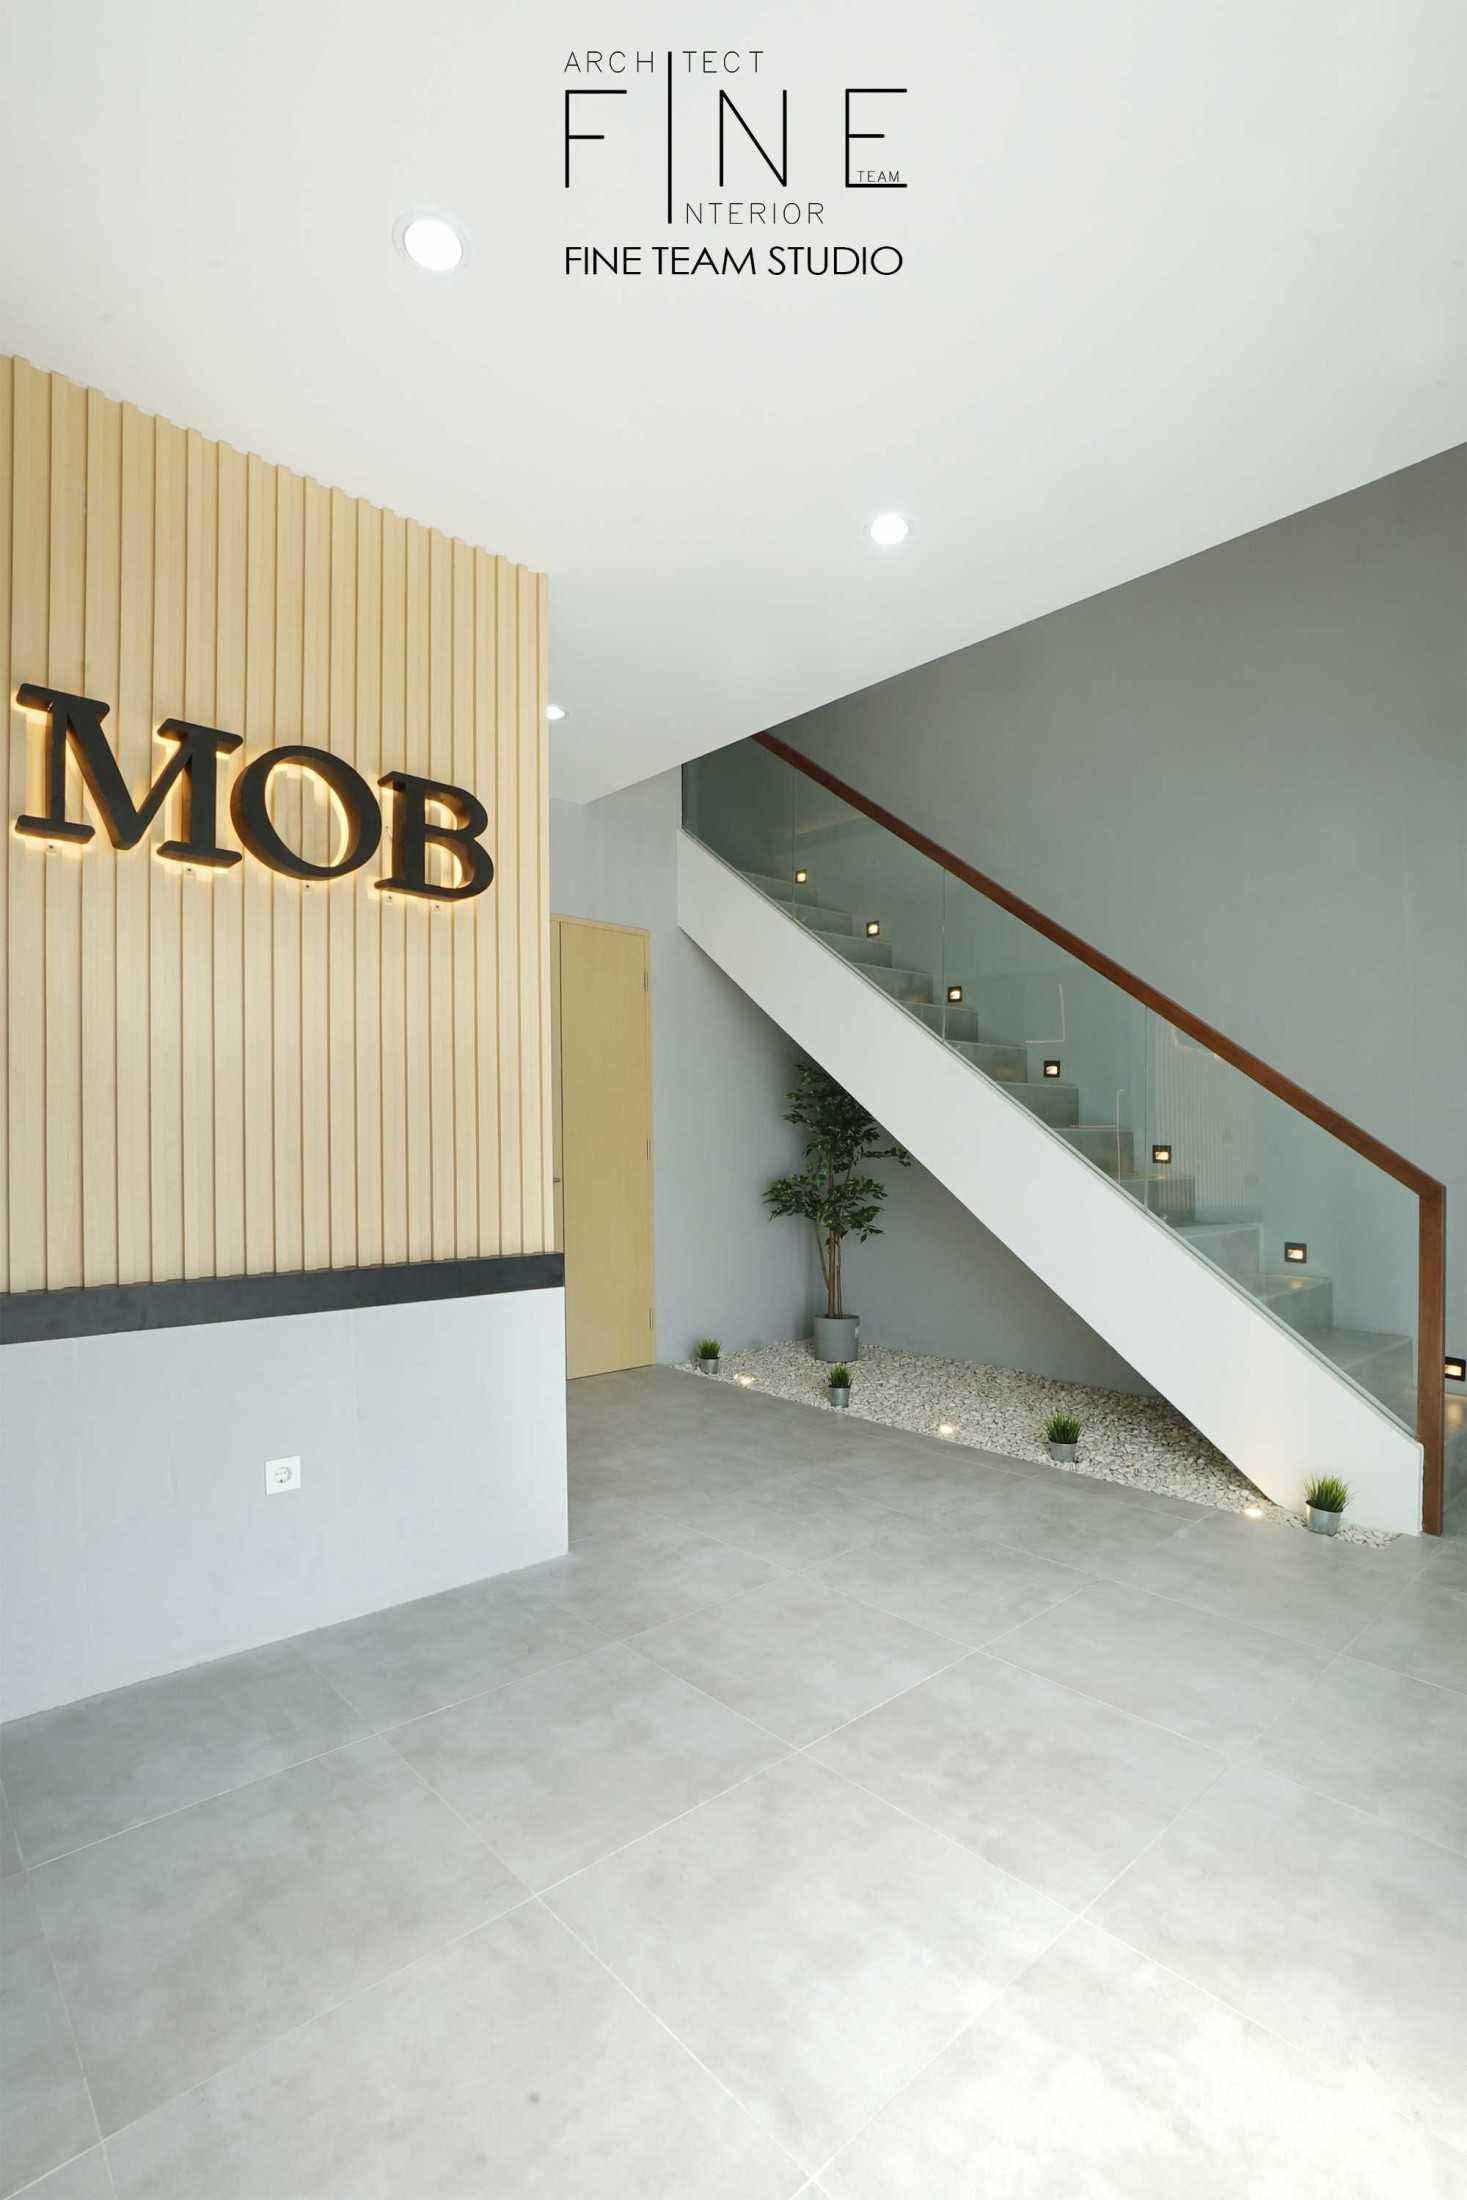 Fine Team Studio Mob Office Cikupa, Tangerang, Banten, Indonesia Cikupa, Tangerang, Banten, Indonesia Fine-Team-Studio-Mob-Office  71167